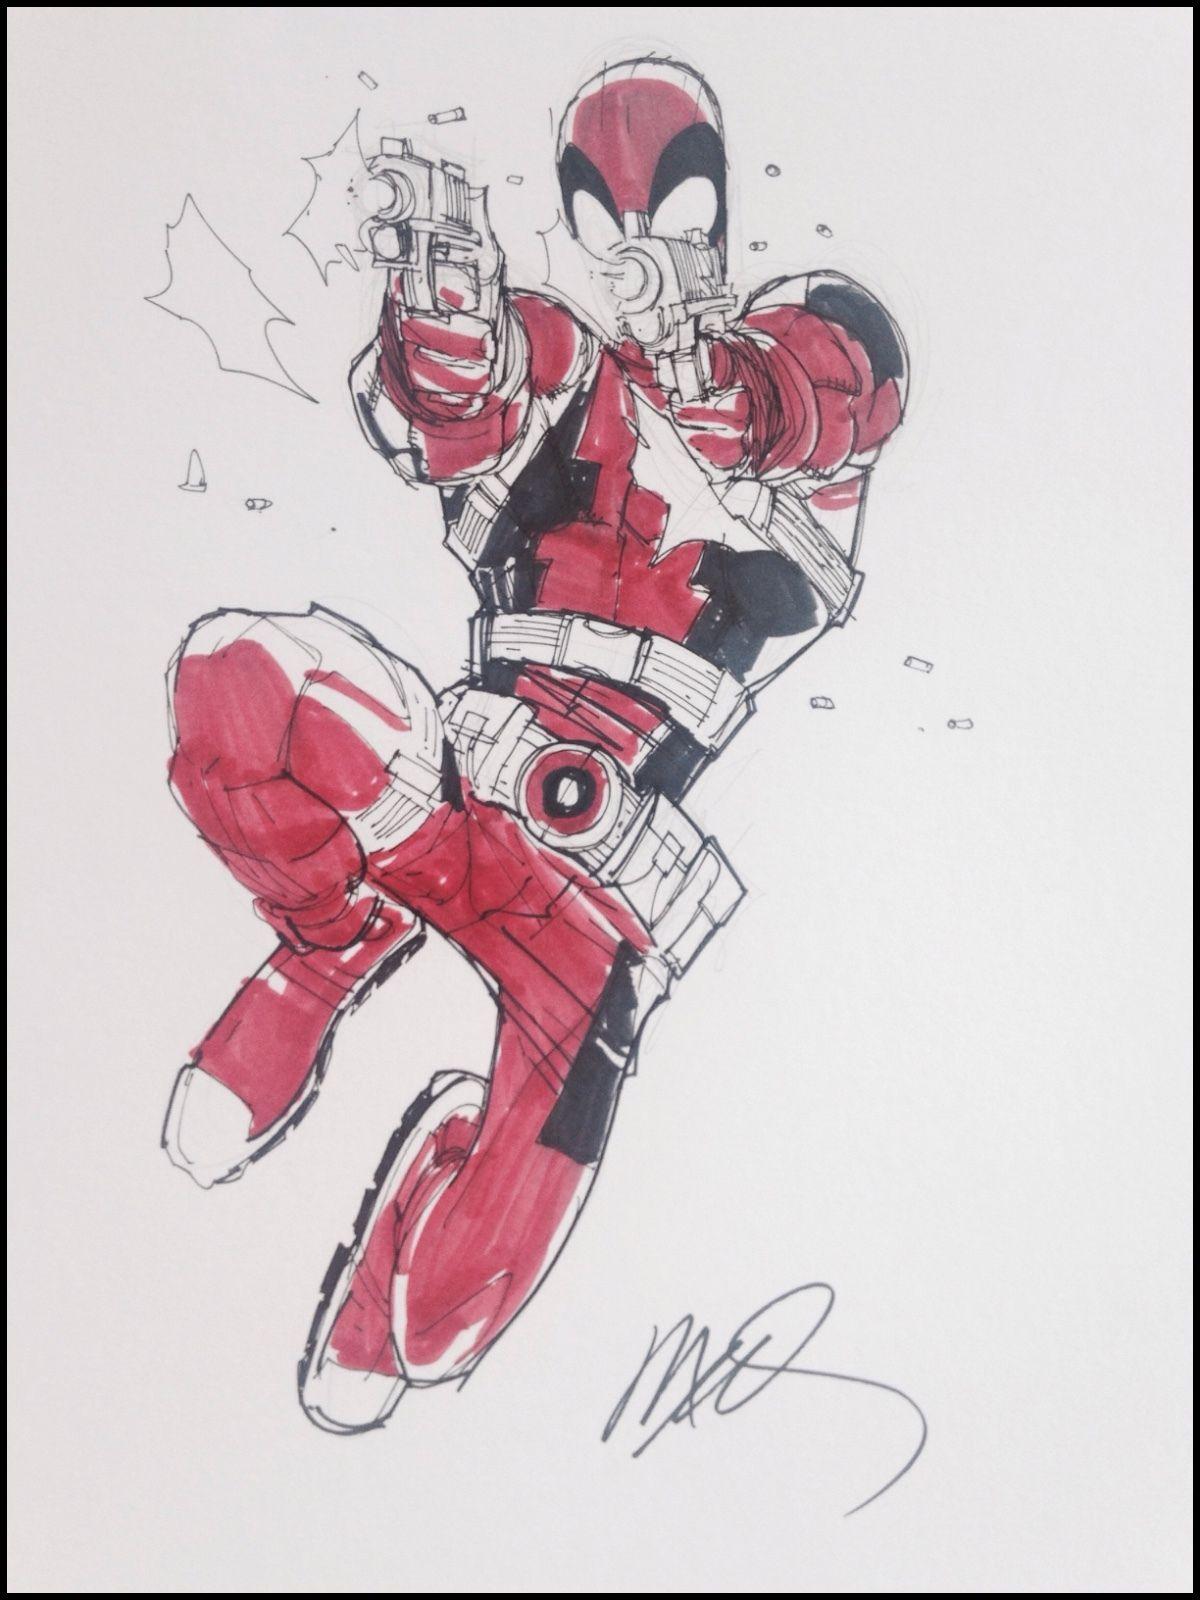 Humberto Ramos Deadpool